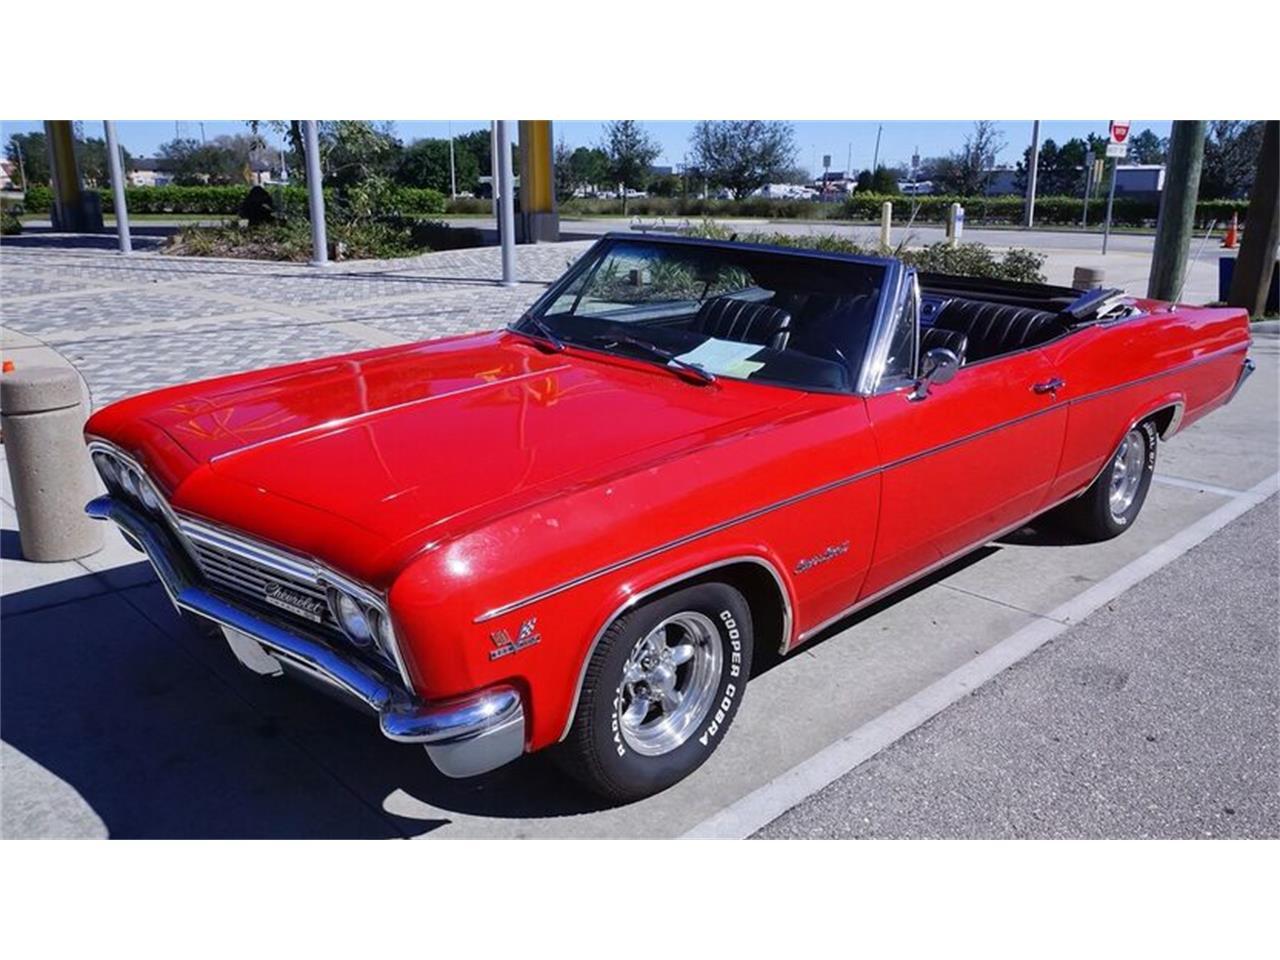 Florida Mazda Dealers >> 1966 Chevrolet Impala SS for Sale   ClassicCars.com   CC ...